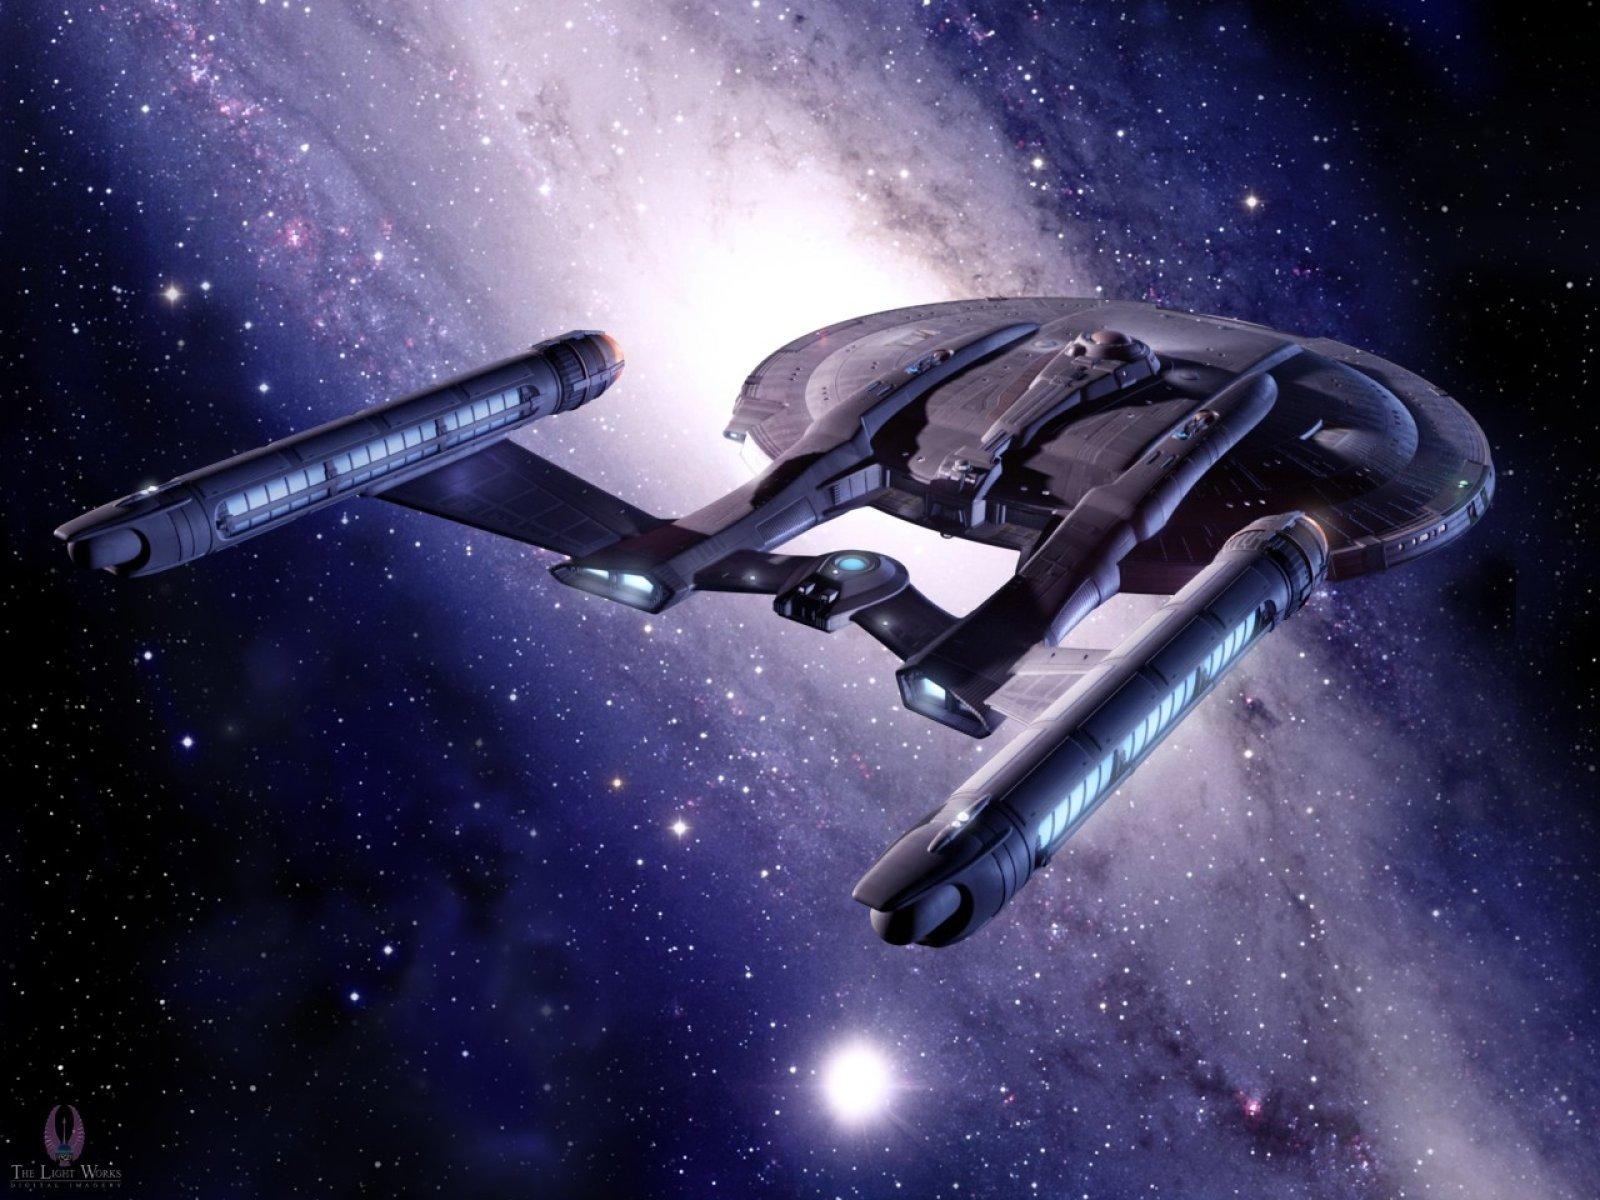 Enterprise NX01 Starship Background wallpaper 1600x1200